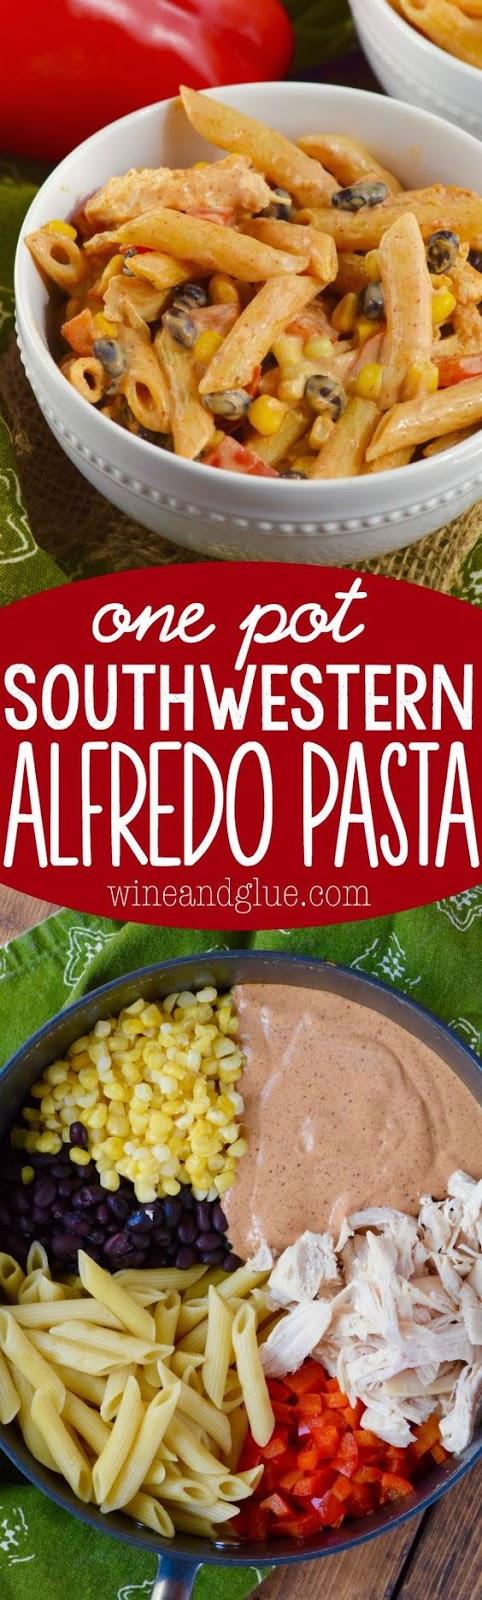 One Pot Southwestern Alfredo Pasta